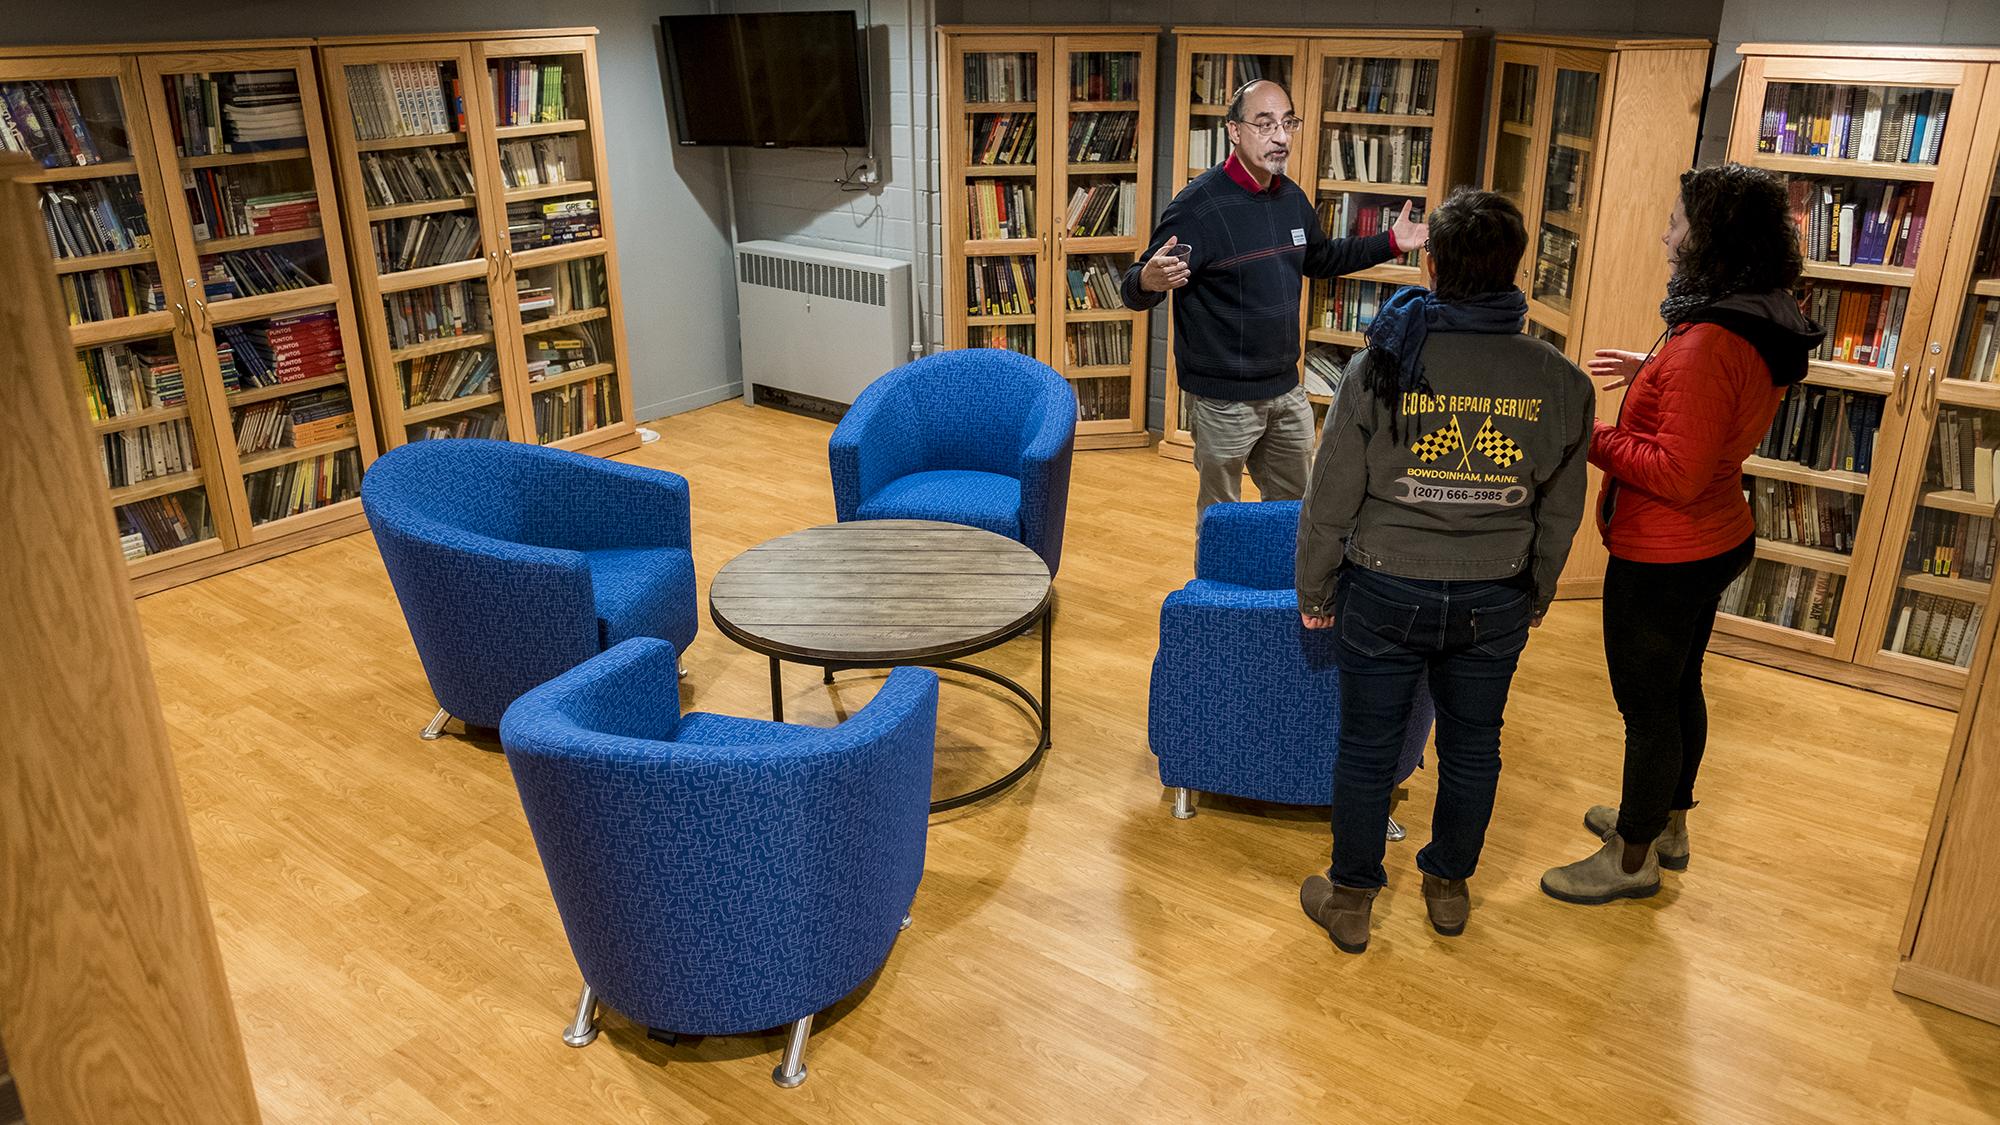 Tour of lending library during CRSSJ open house